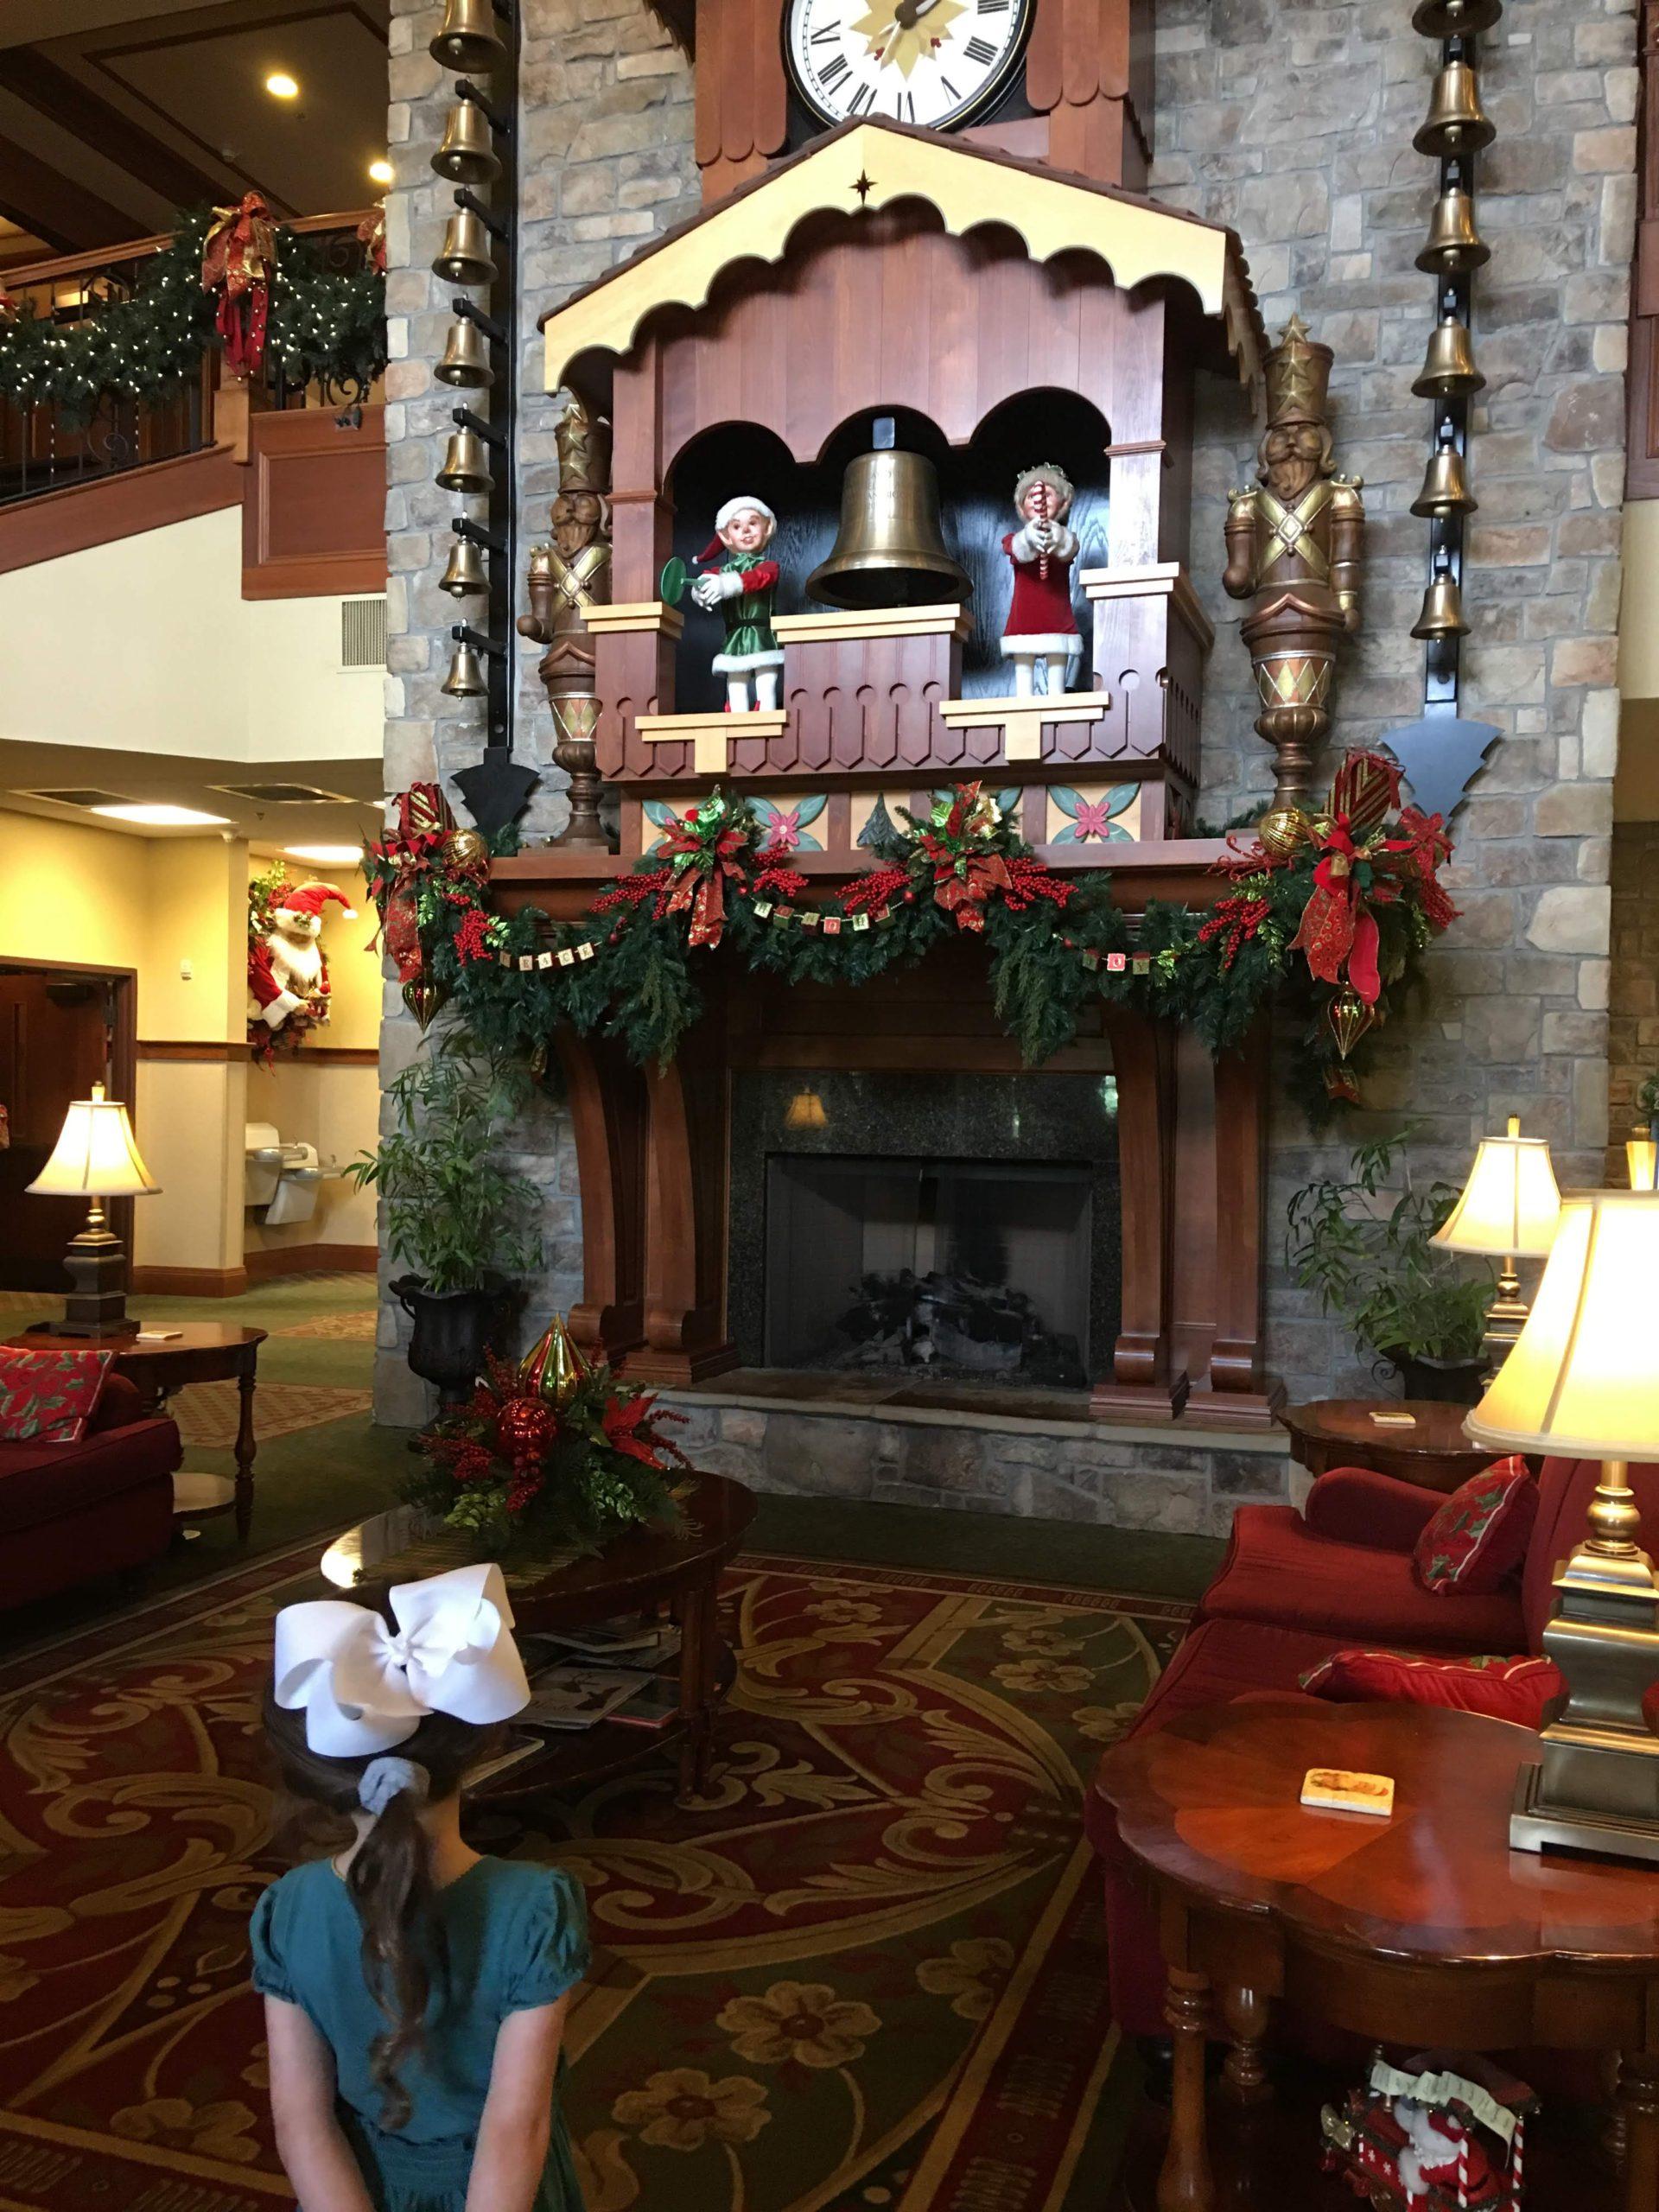 Chattanooga Choo Choo Historic Hotel